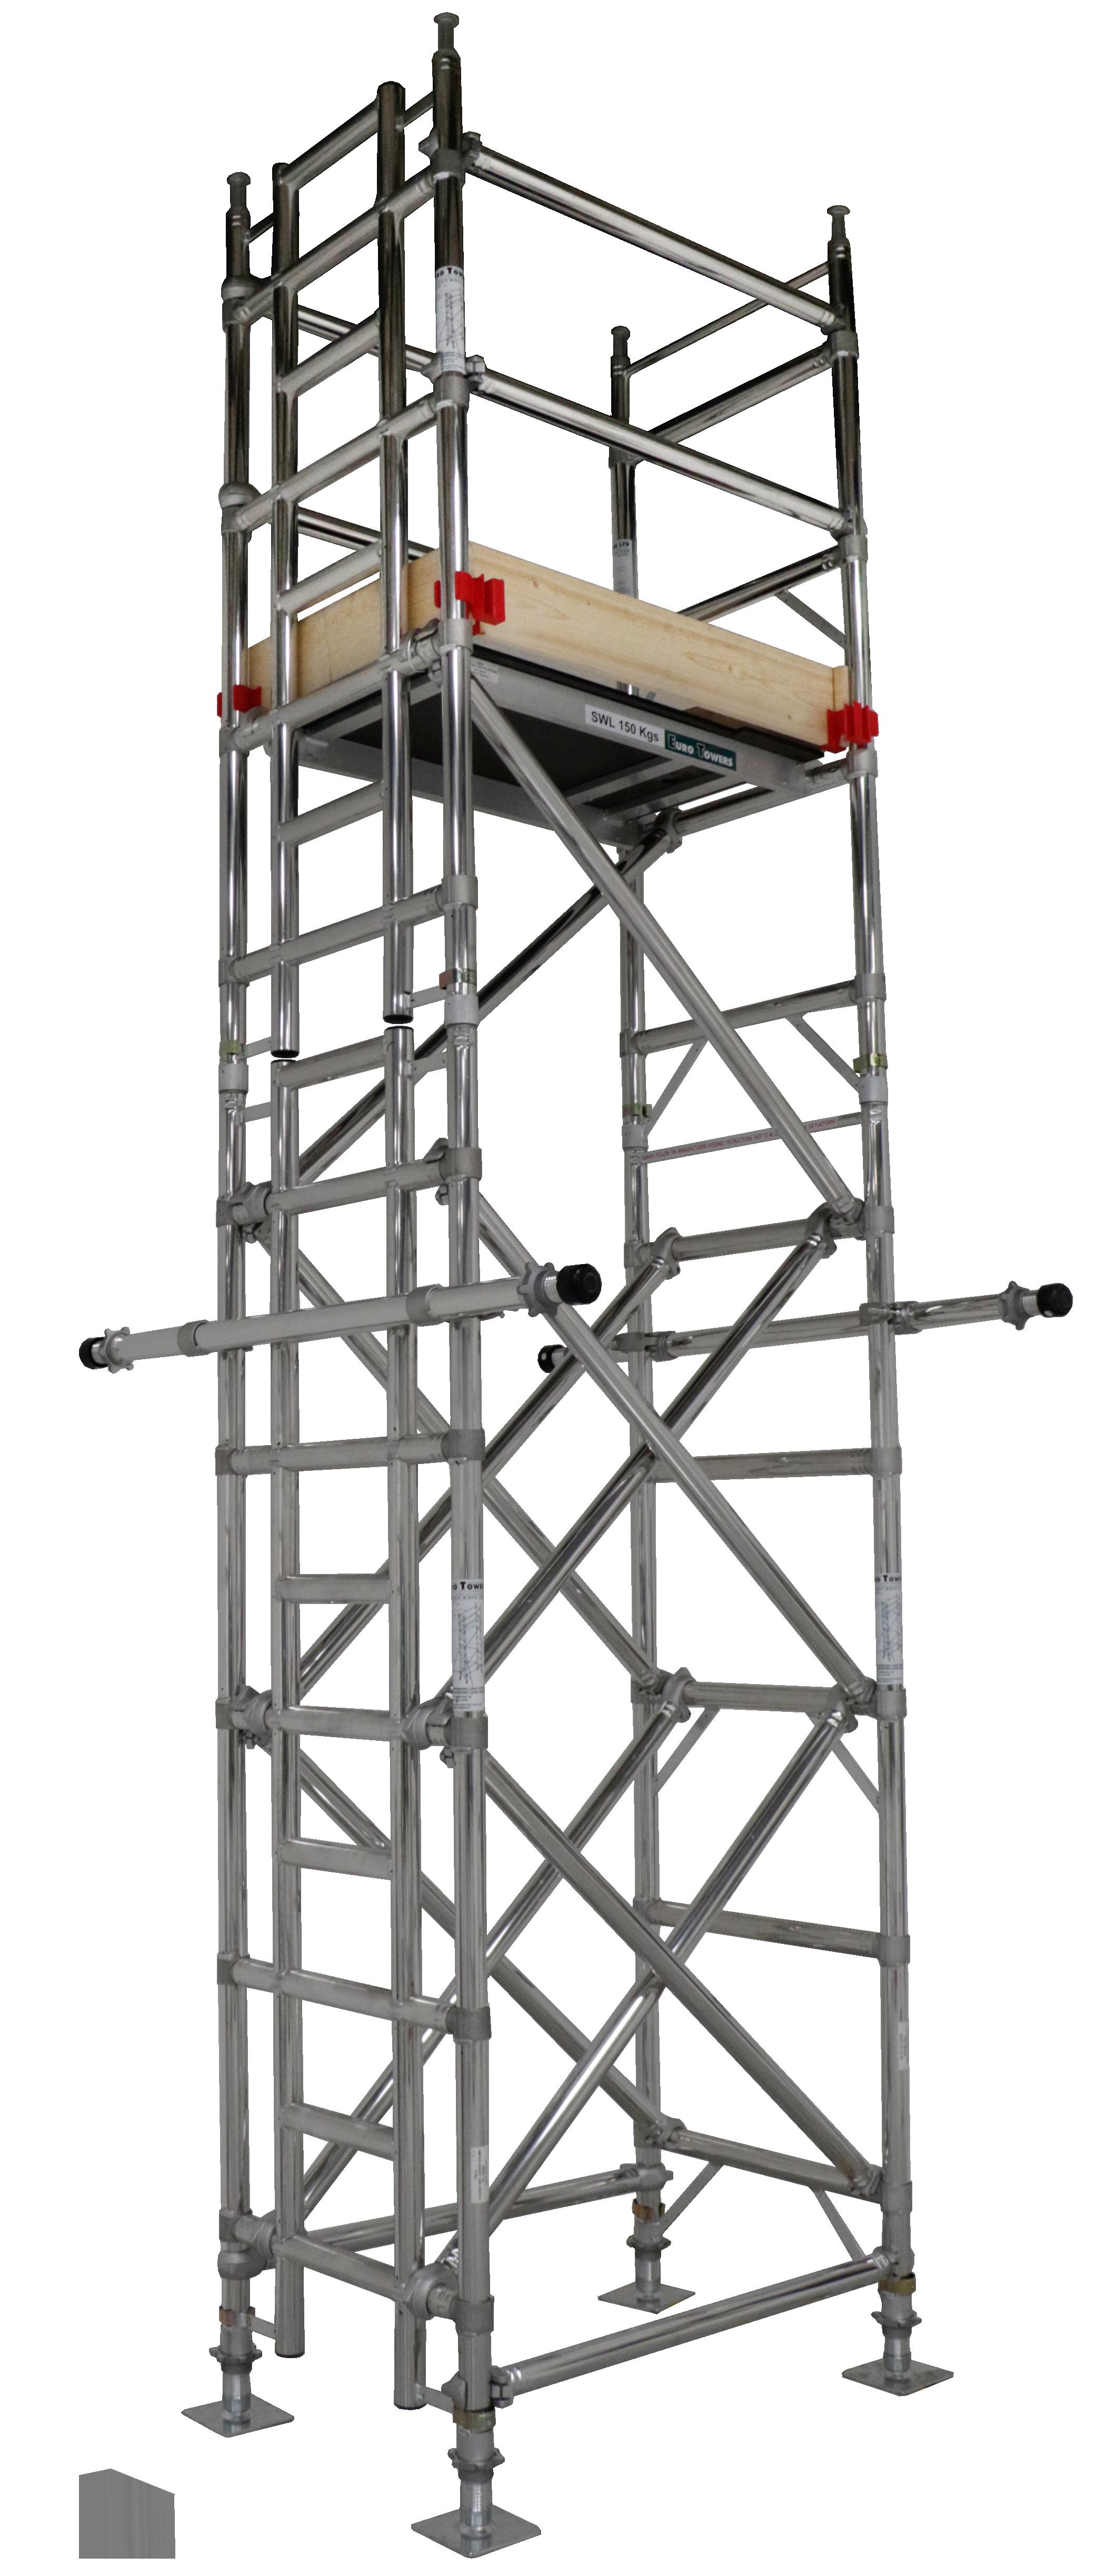 Lift shaft tower, assembly guide, lift shaft access, working at height, aluminium access, aluminium tower